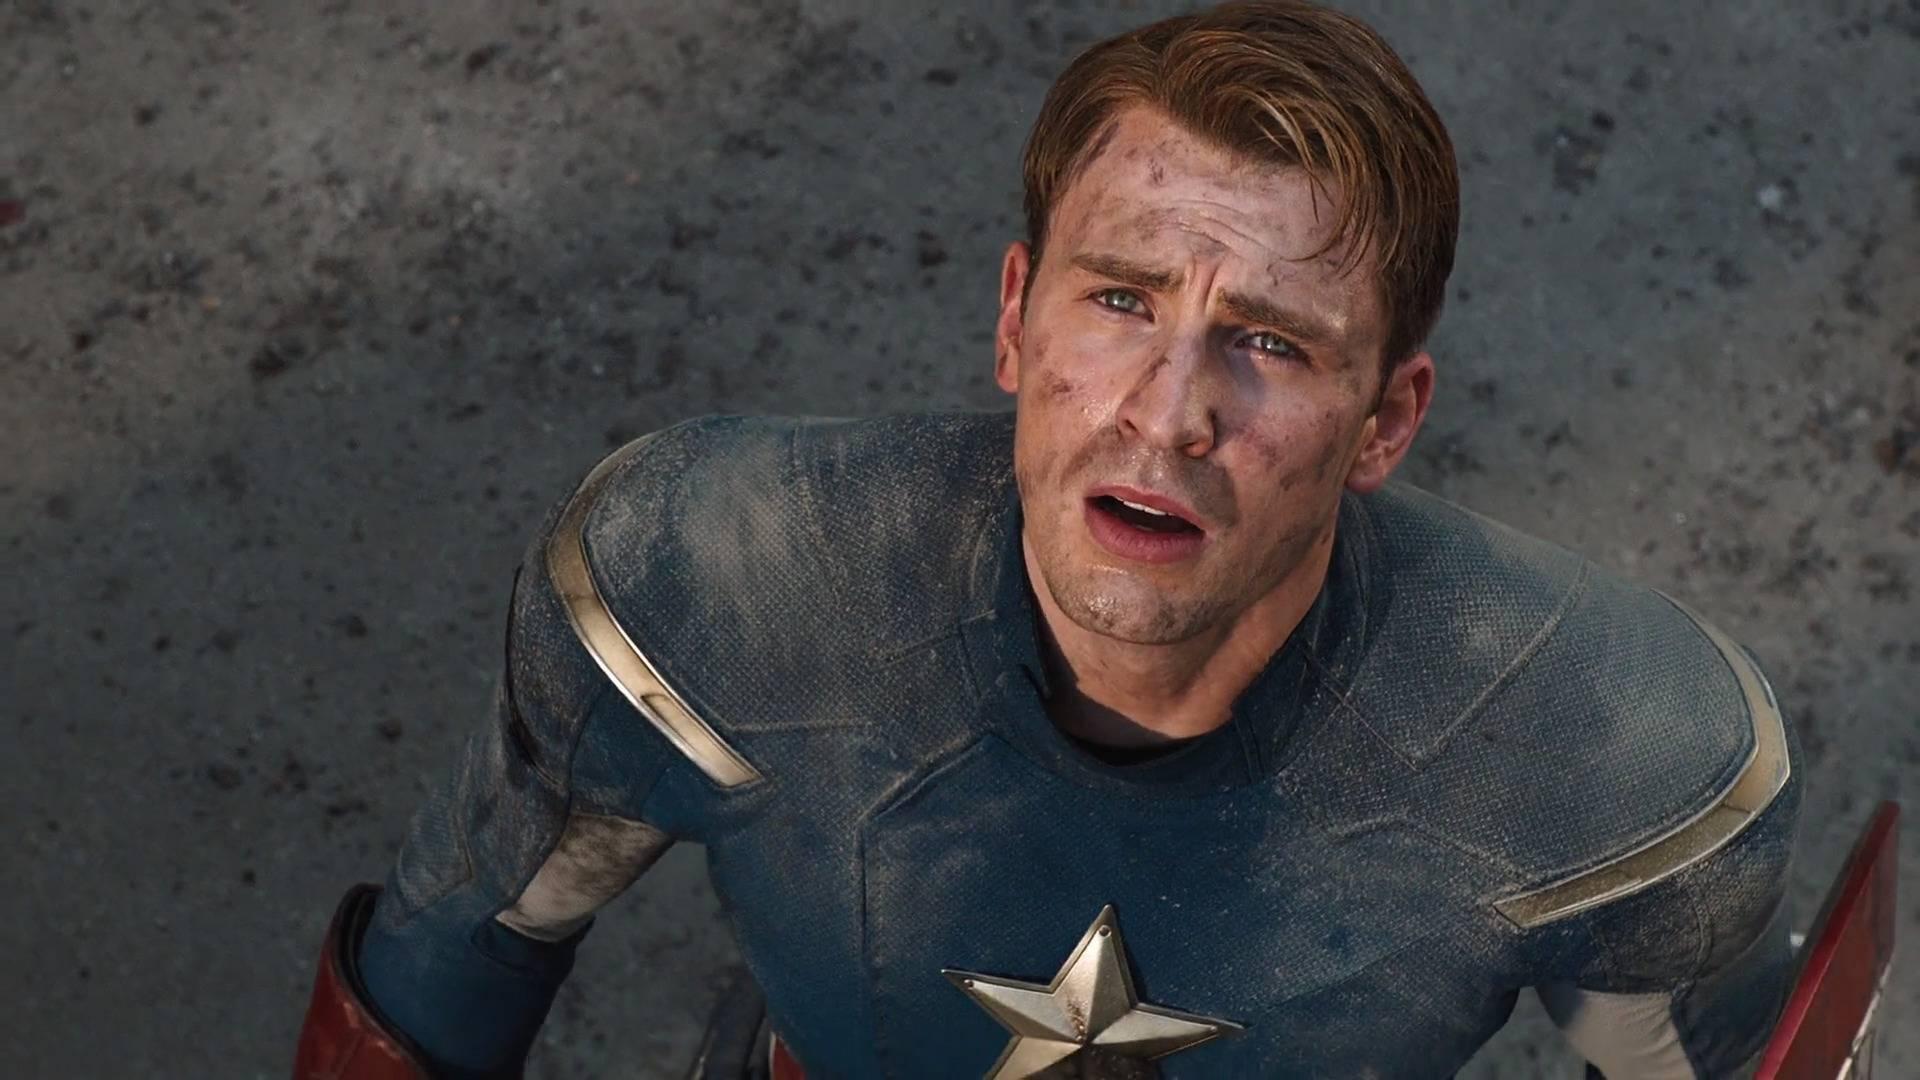 steve rogers hates america, might not return as captain america